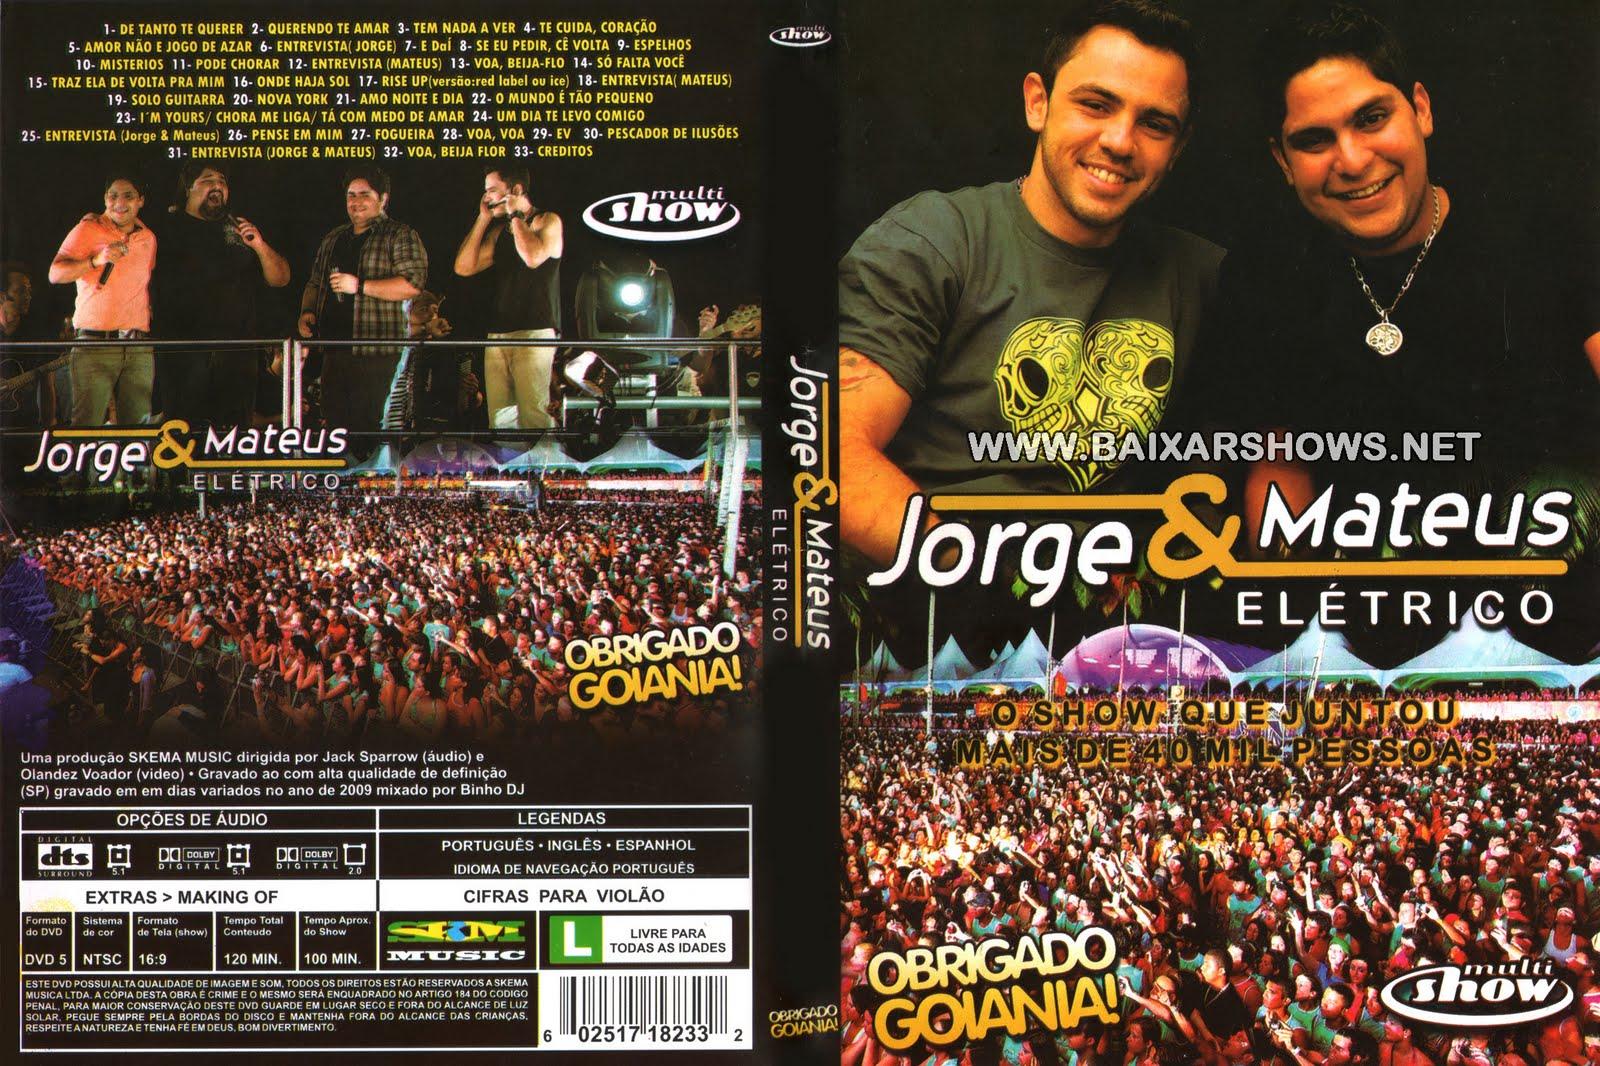 PERFIL JORGE VERCILO BAIXAR DO CD